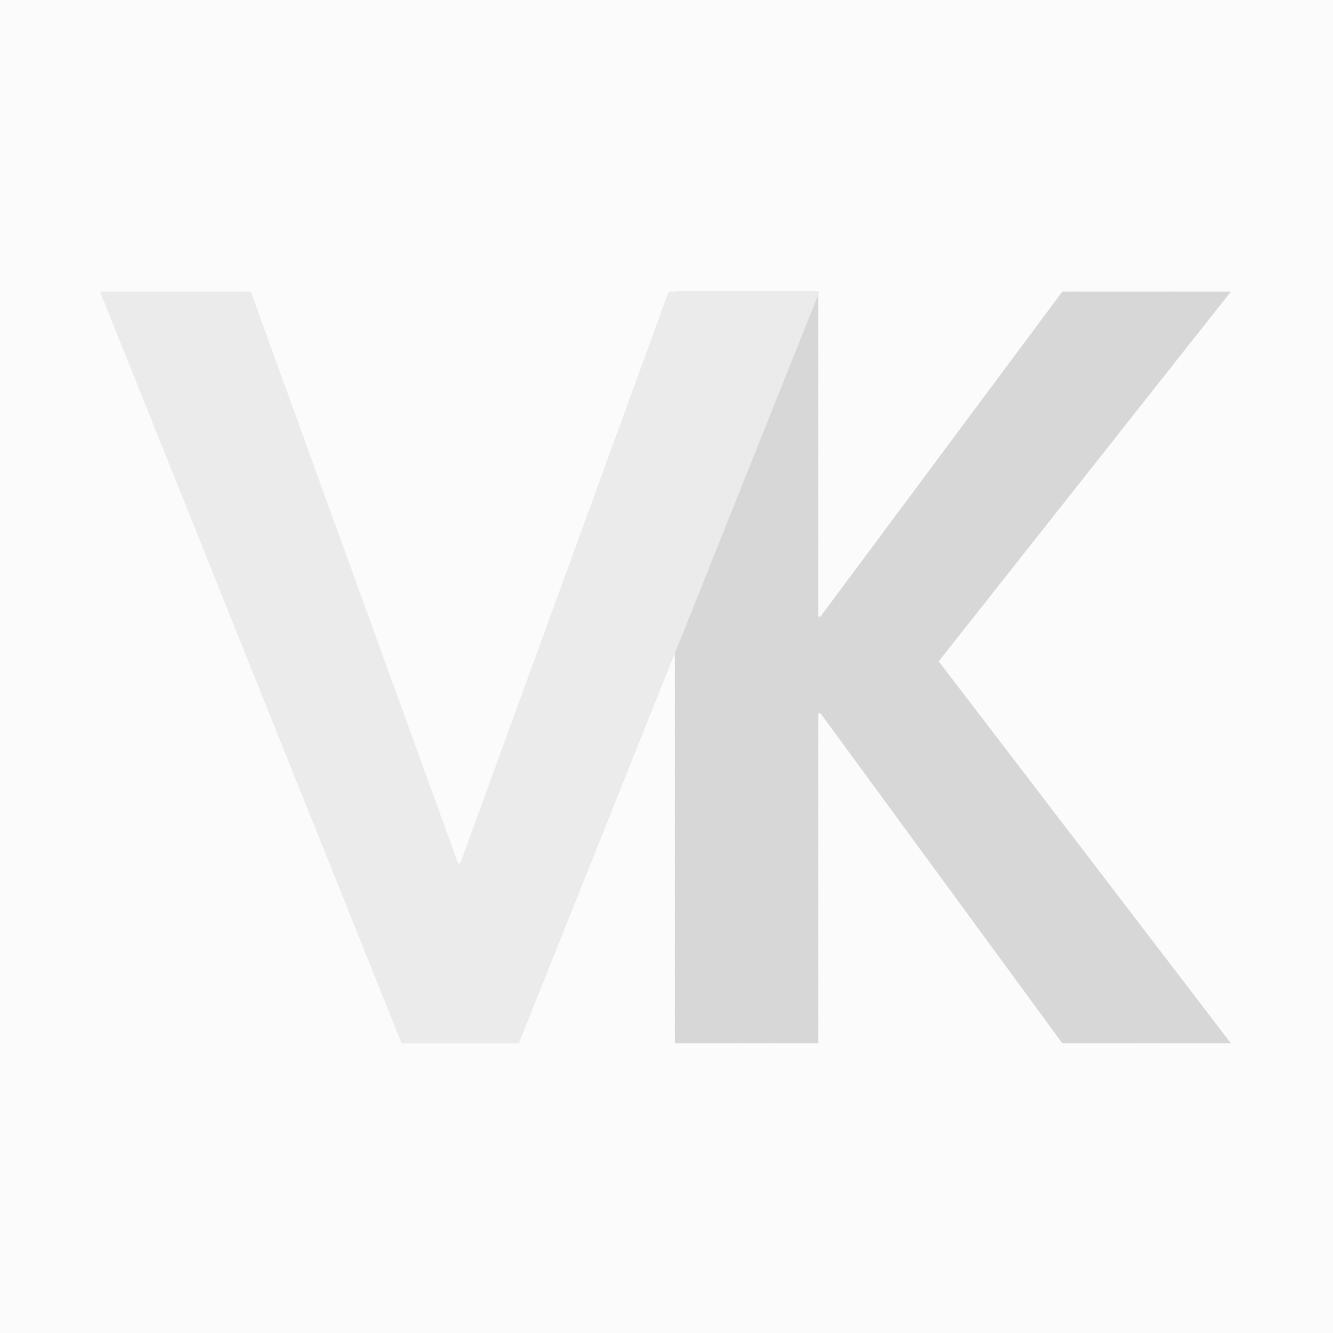 Klem Aluminium/Kunstof Ganzebek Multi Colore 6stuks